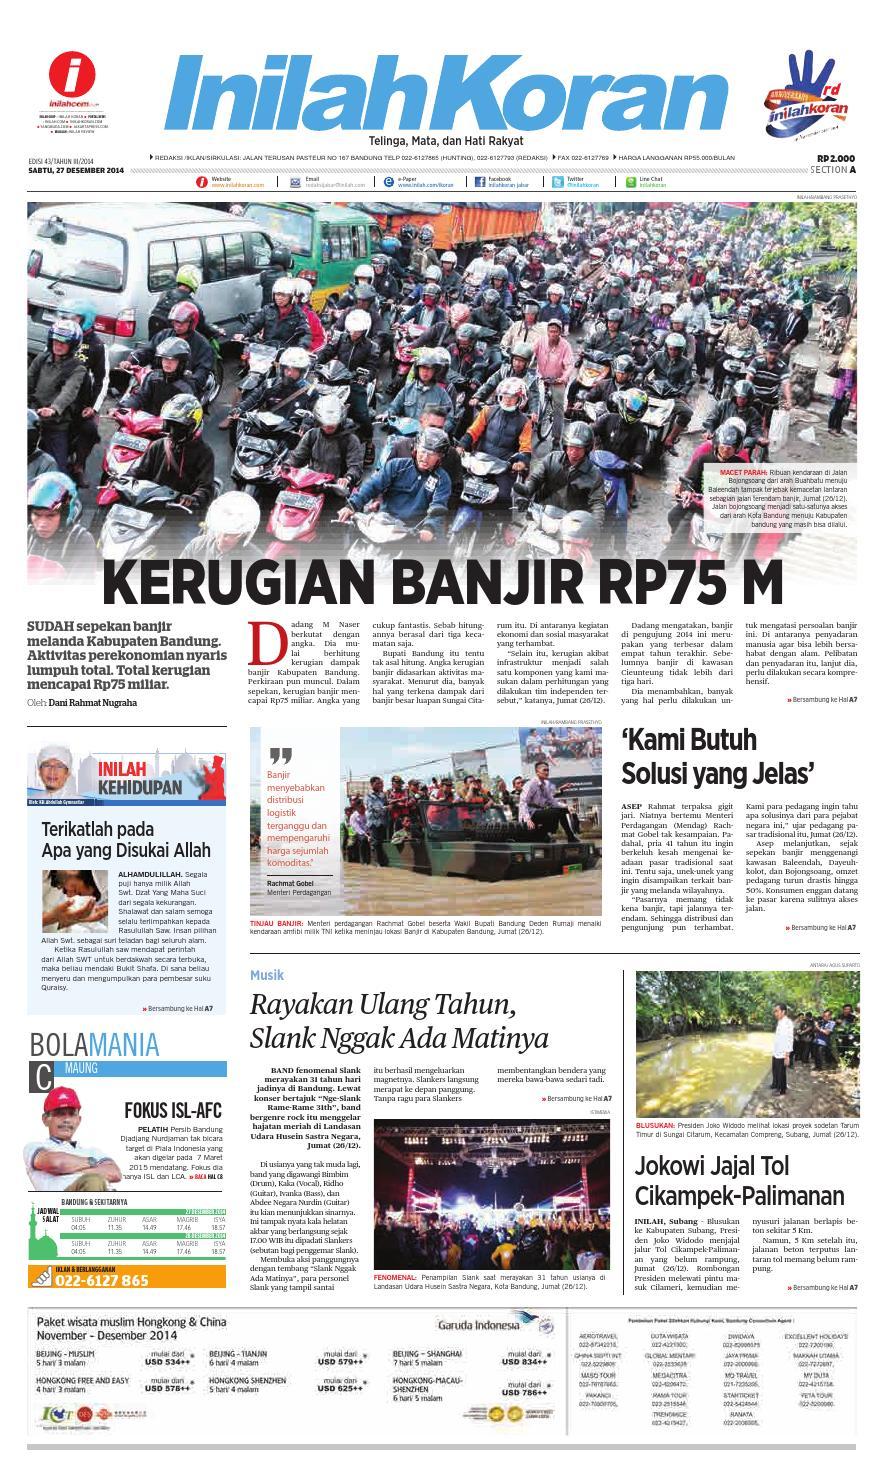 KERUGIAN BANJIR RP75 M by inilah koran - issuu 1efcb43b1a